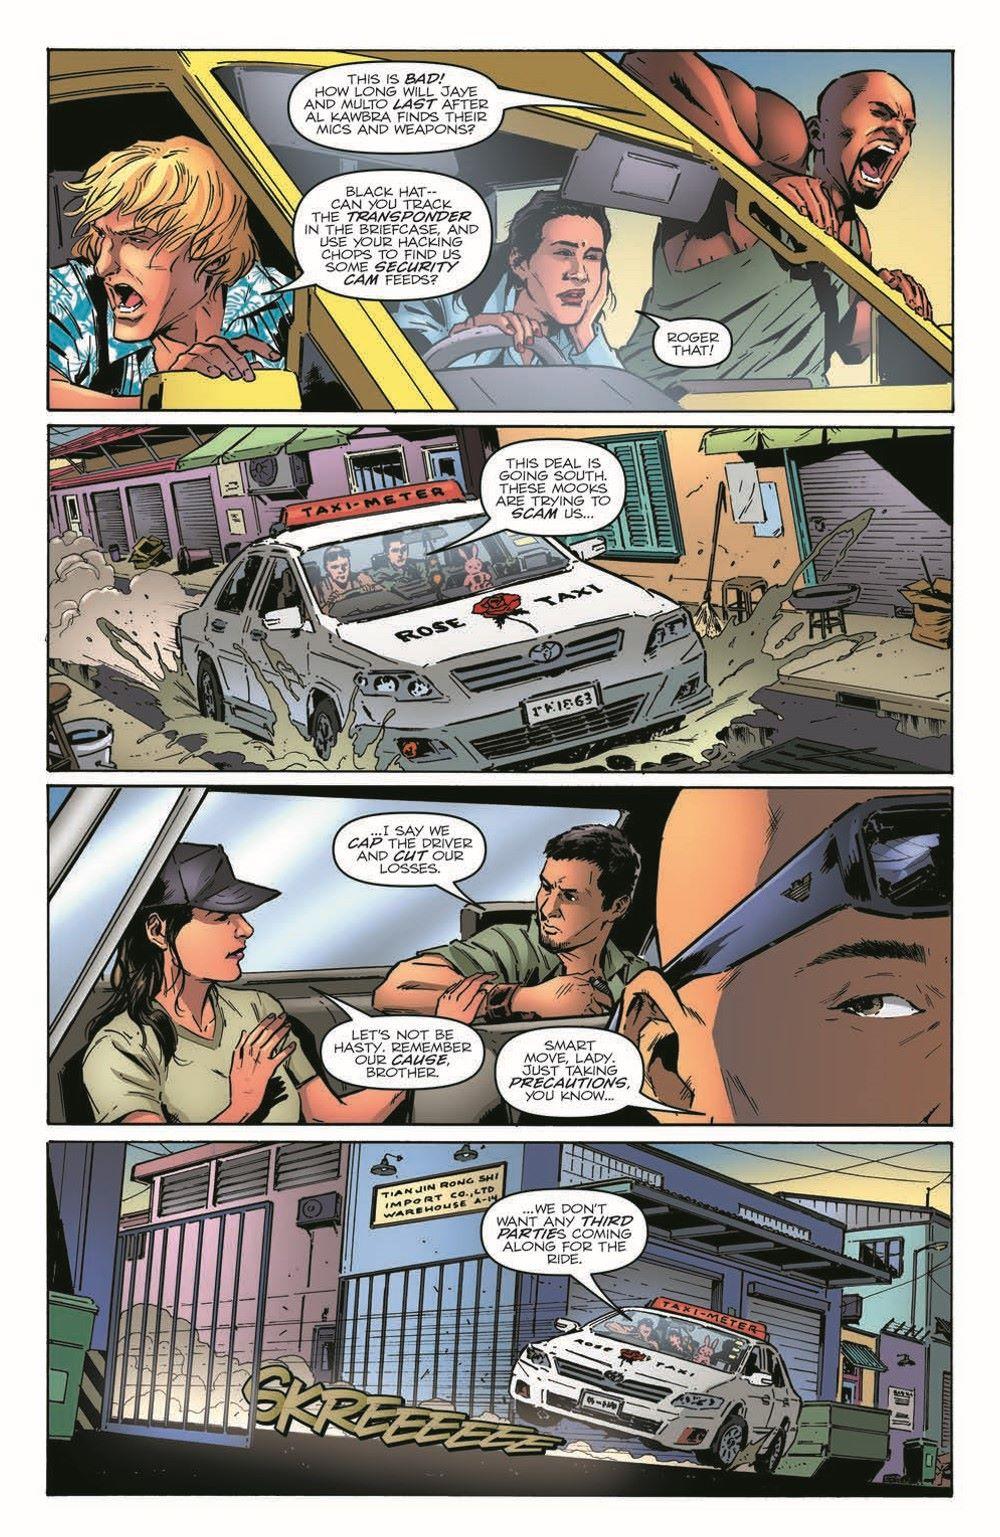 GIJoeRAH283-pr-6 ComicList Previews: G.I. JOE A REAL AMERICAN HERO #283